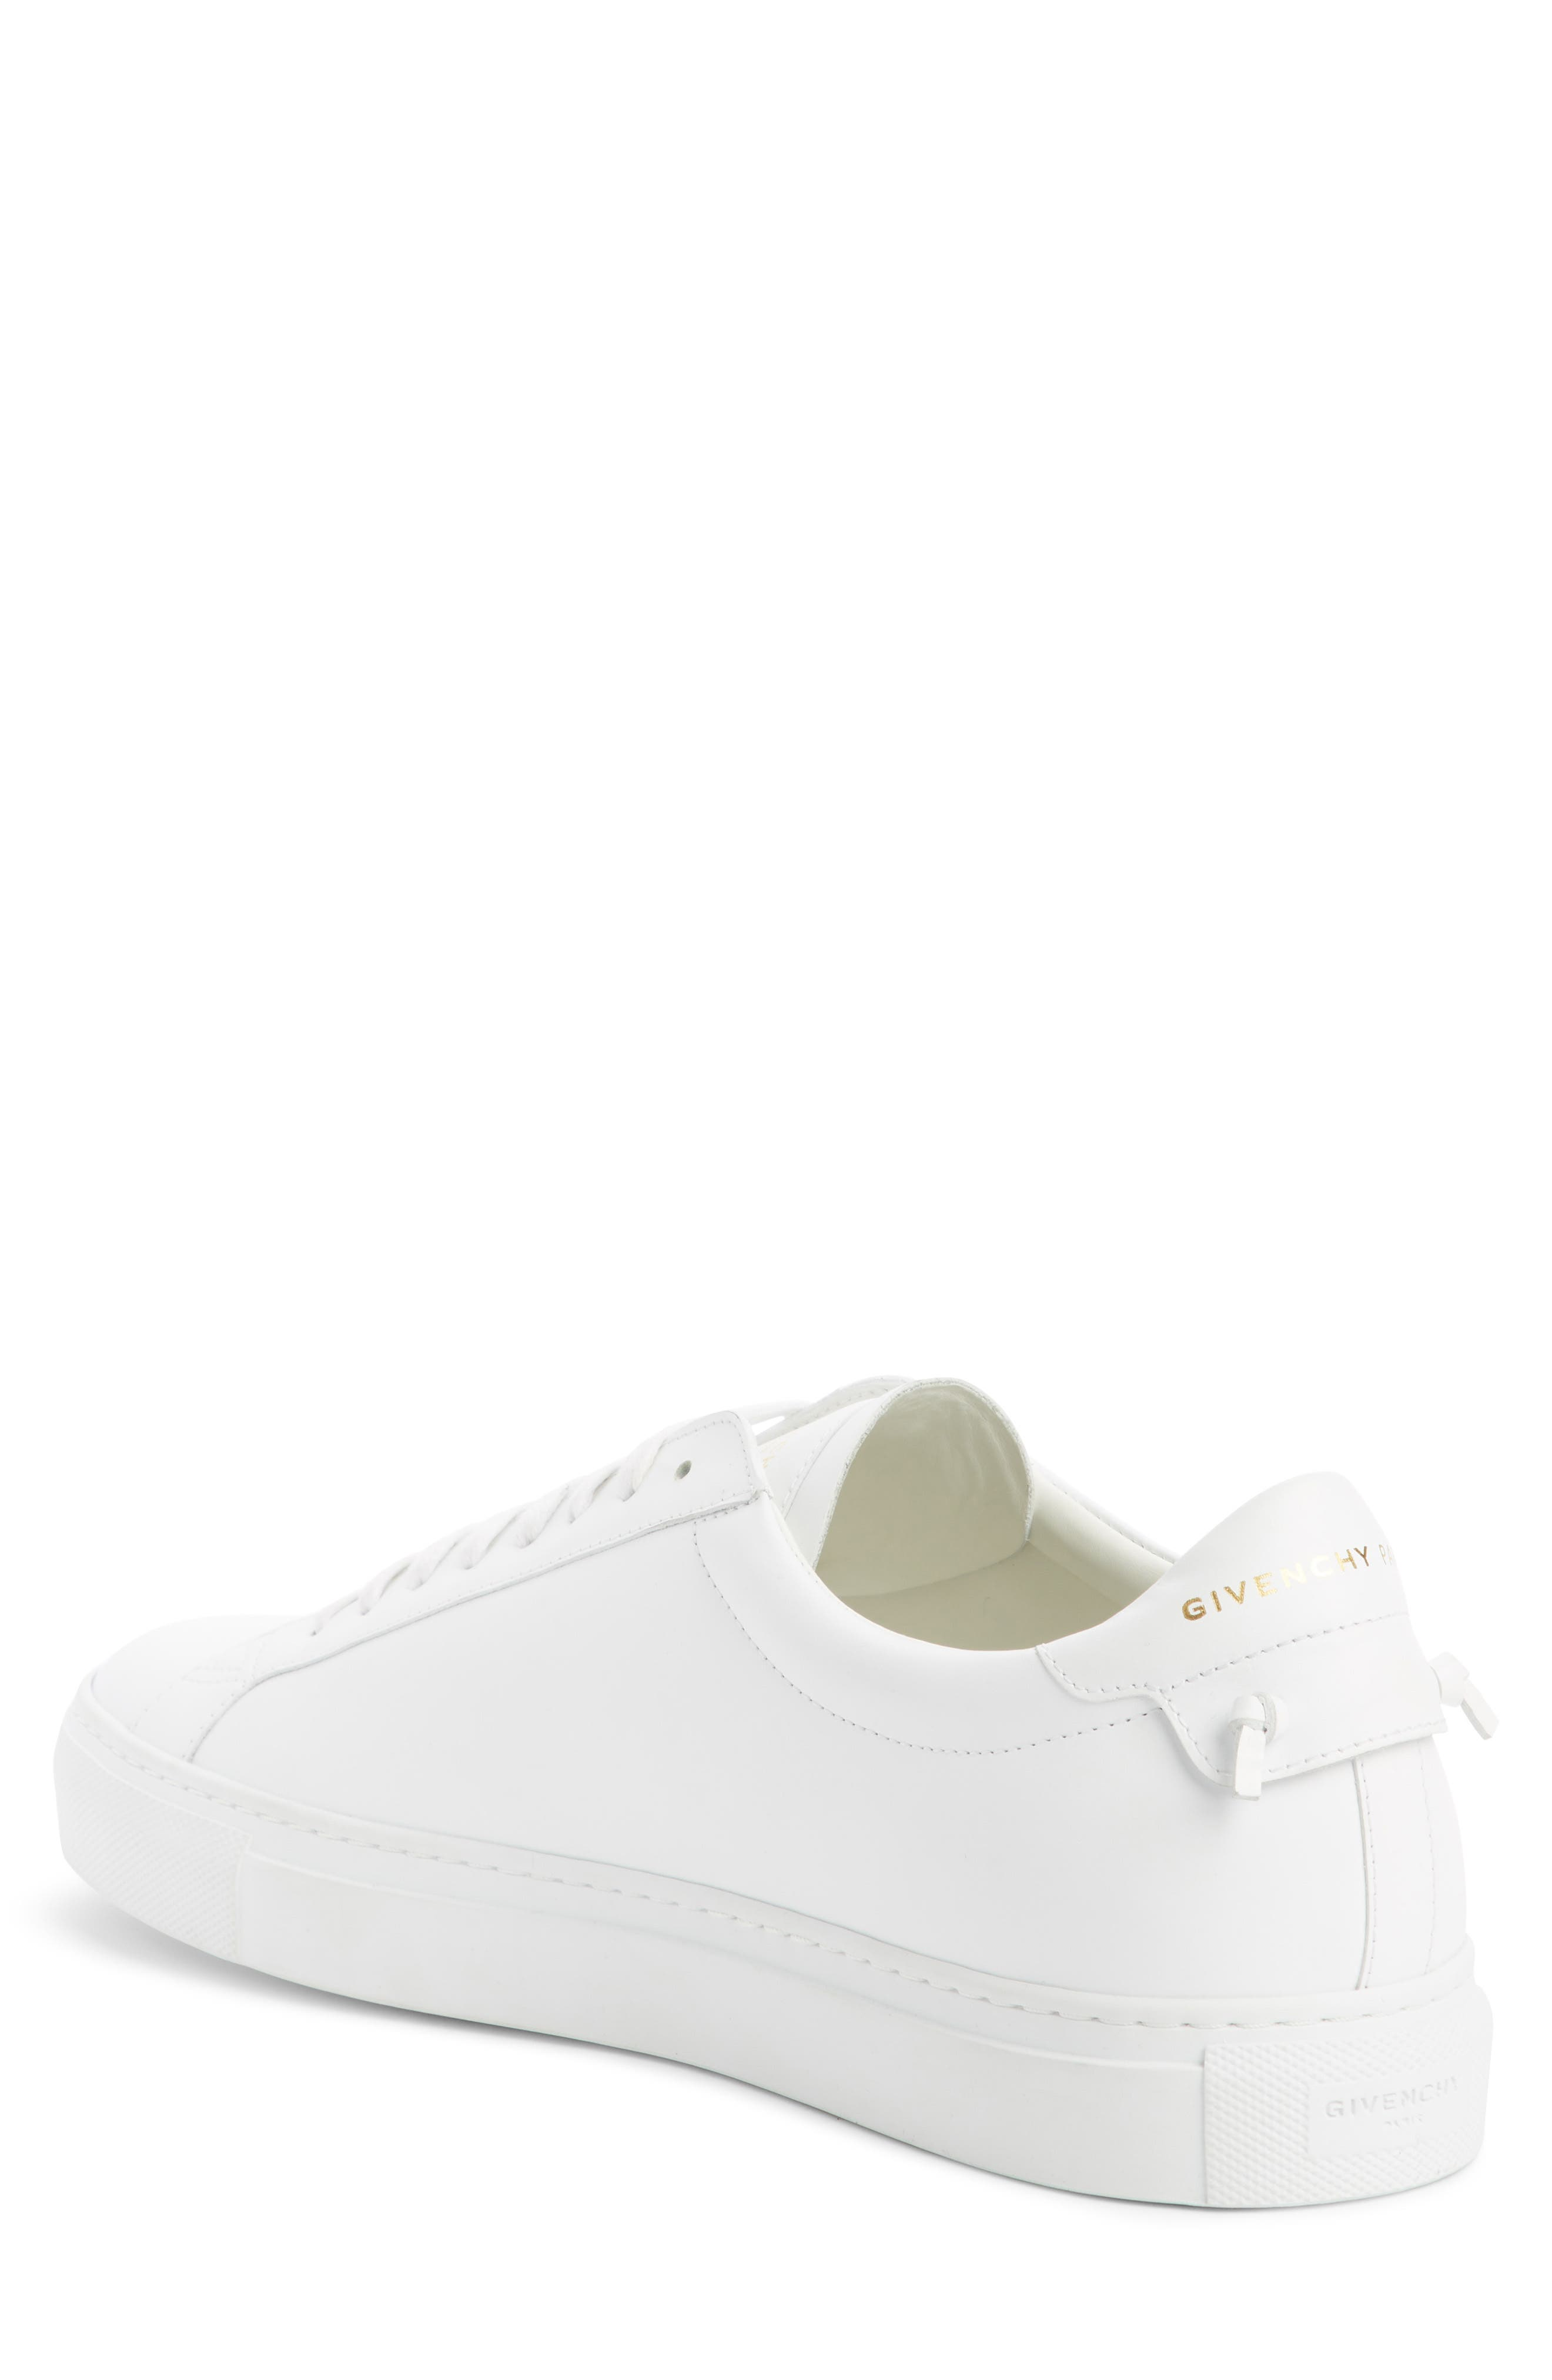 'Urban Knots Lo' Sneaker,                             Alternate thumbnail 2, color,                             WHITE/ WHITE